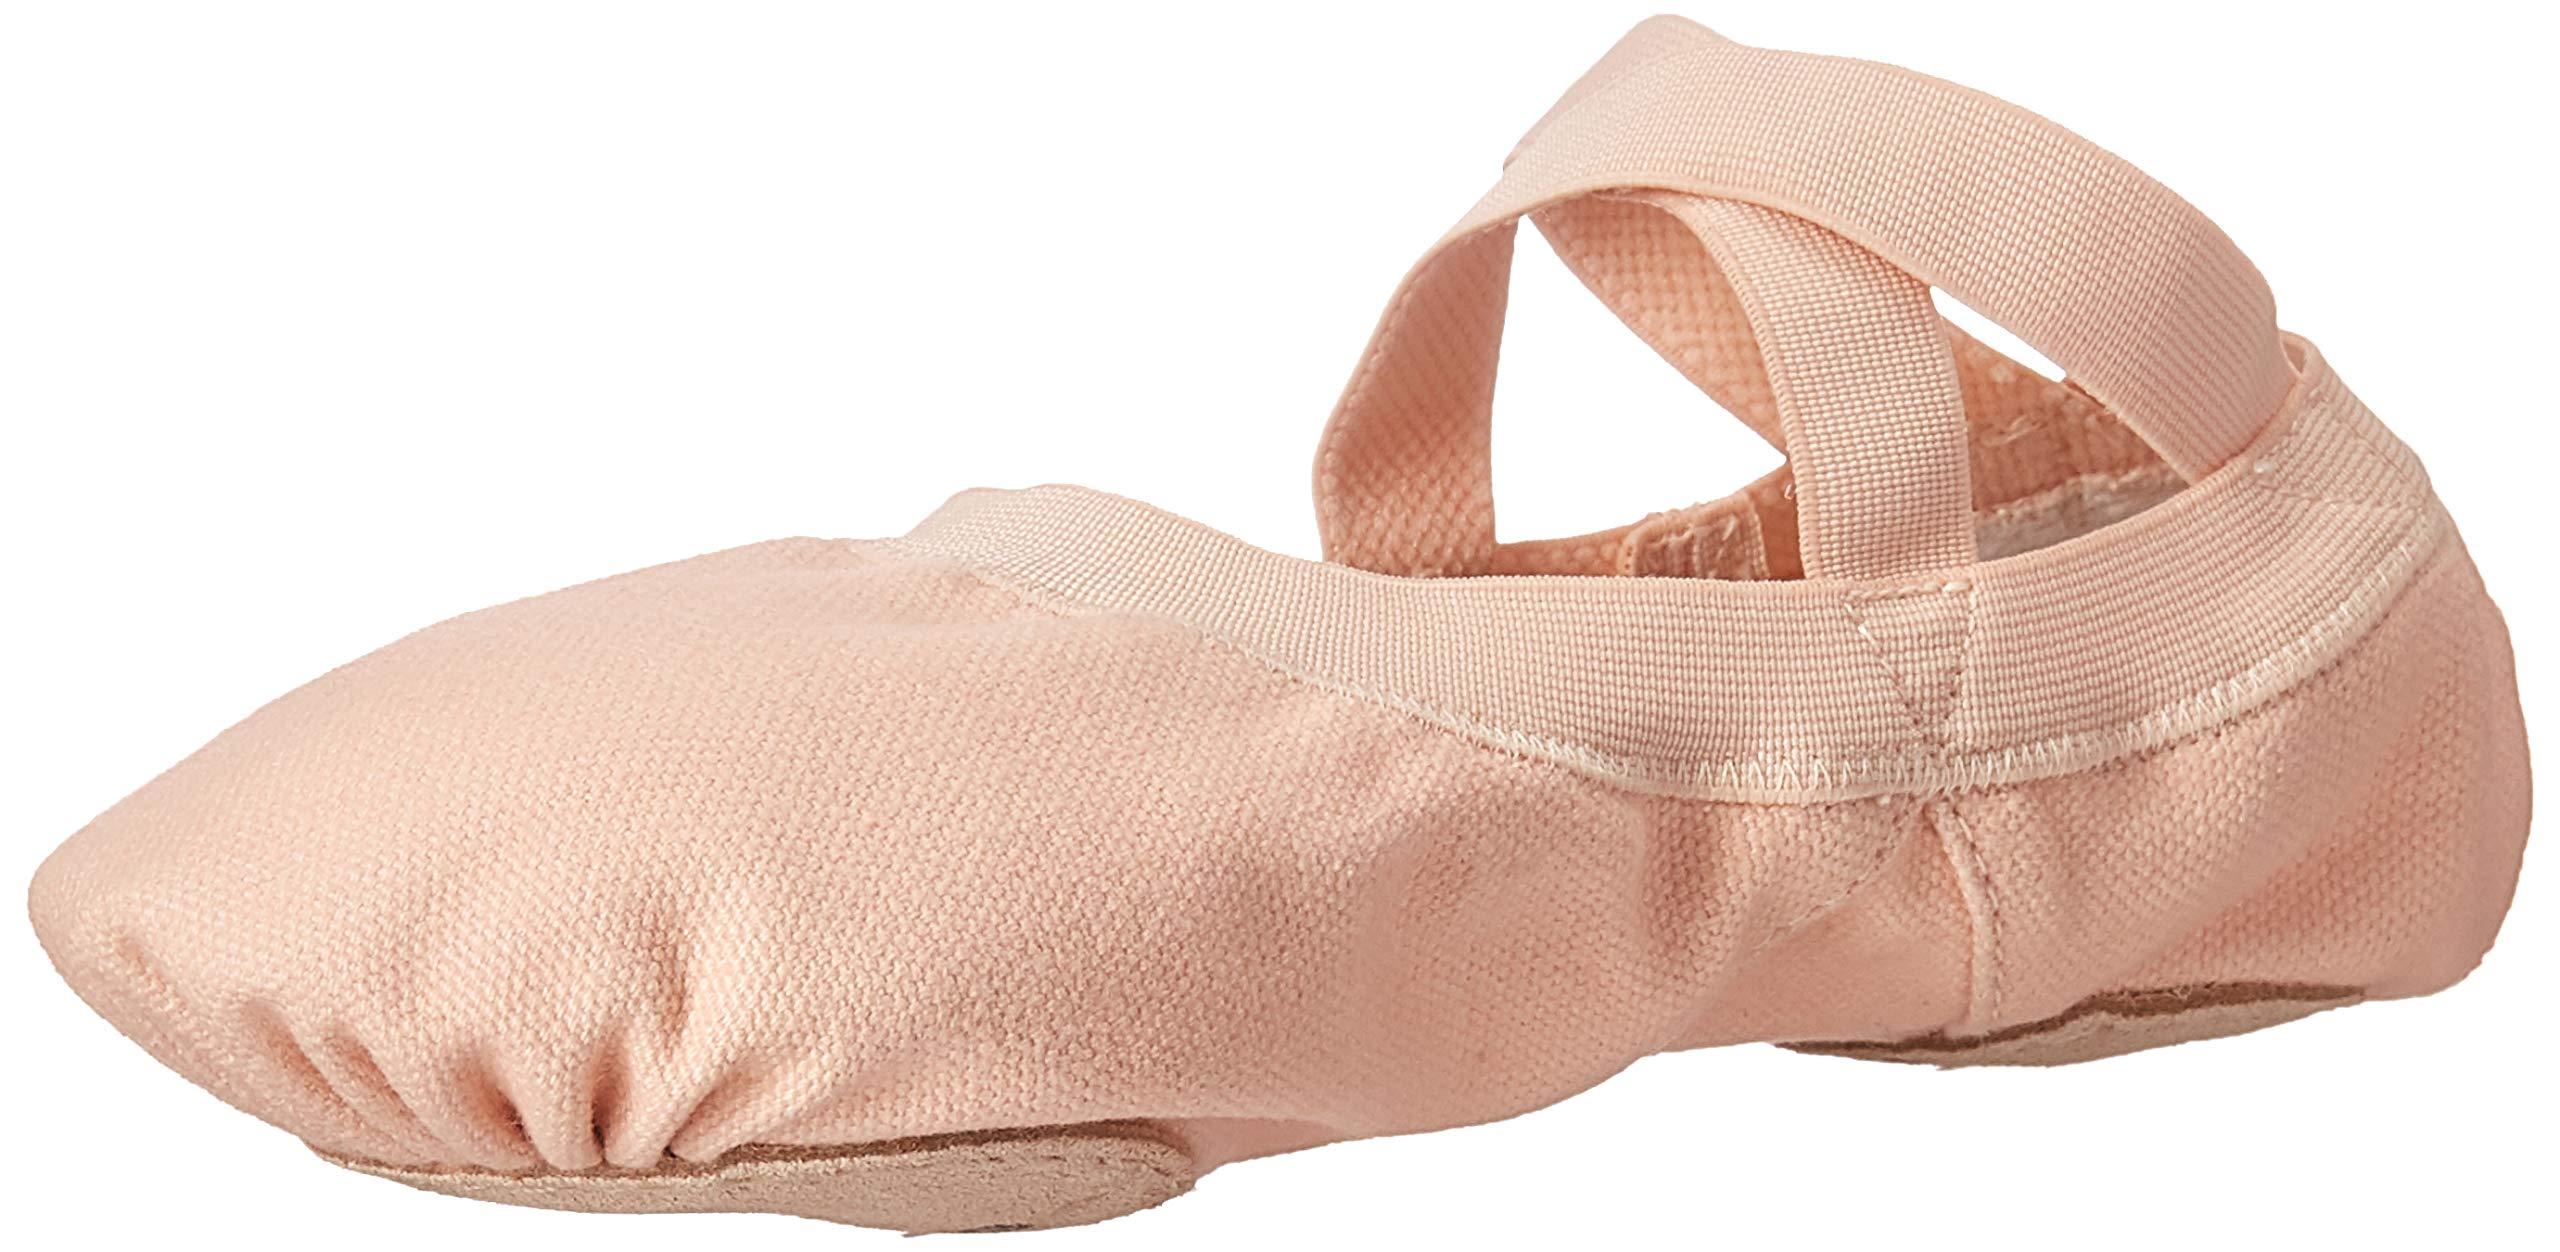 Bloch Dance Girls Performa Dance Shoe Theatrical Pink 12 D US Little Kid